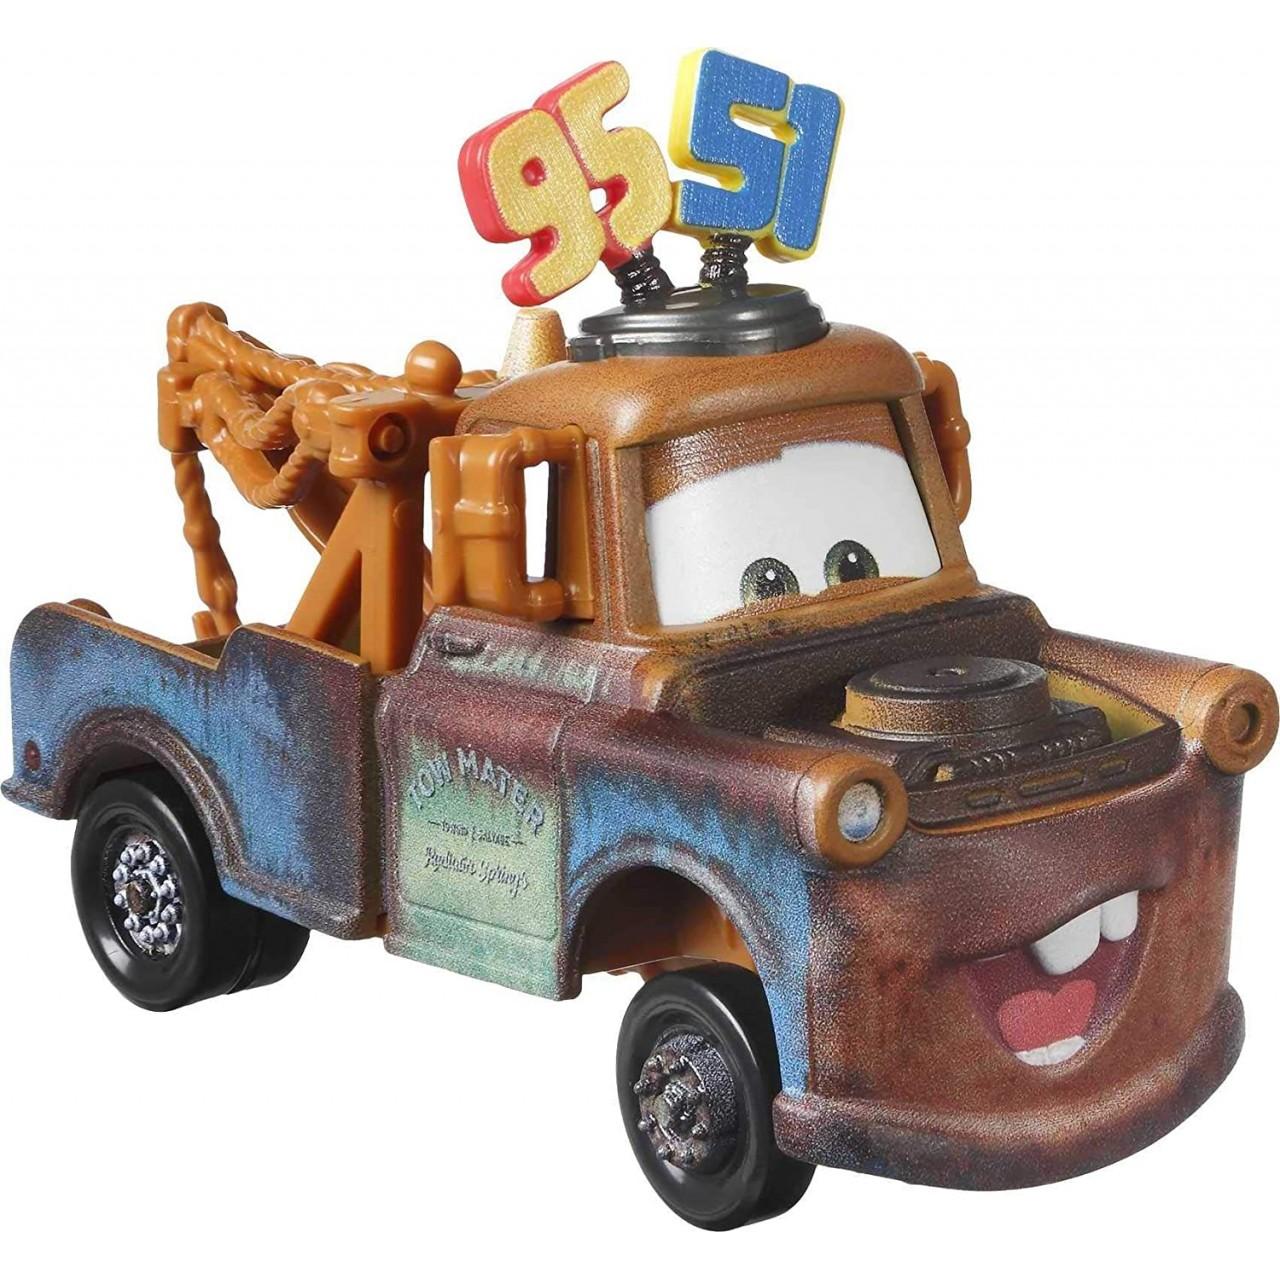 Disney / Pixar Тачки 3 Deluxe: Метр колекція 95/51 (Disney Pixar Cars Deluxe Red GRP94) від Mattel